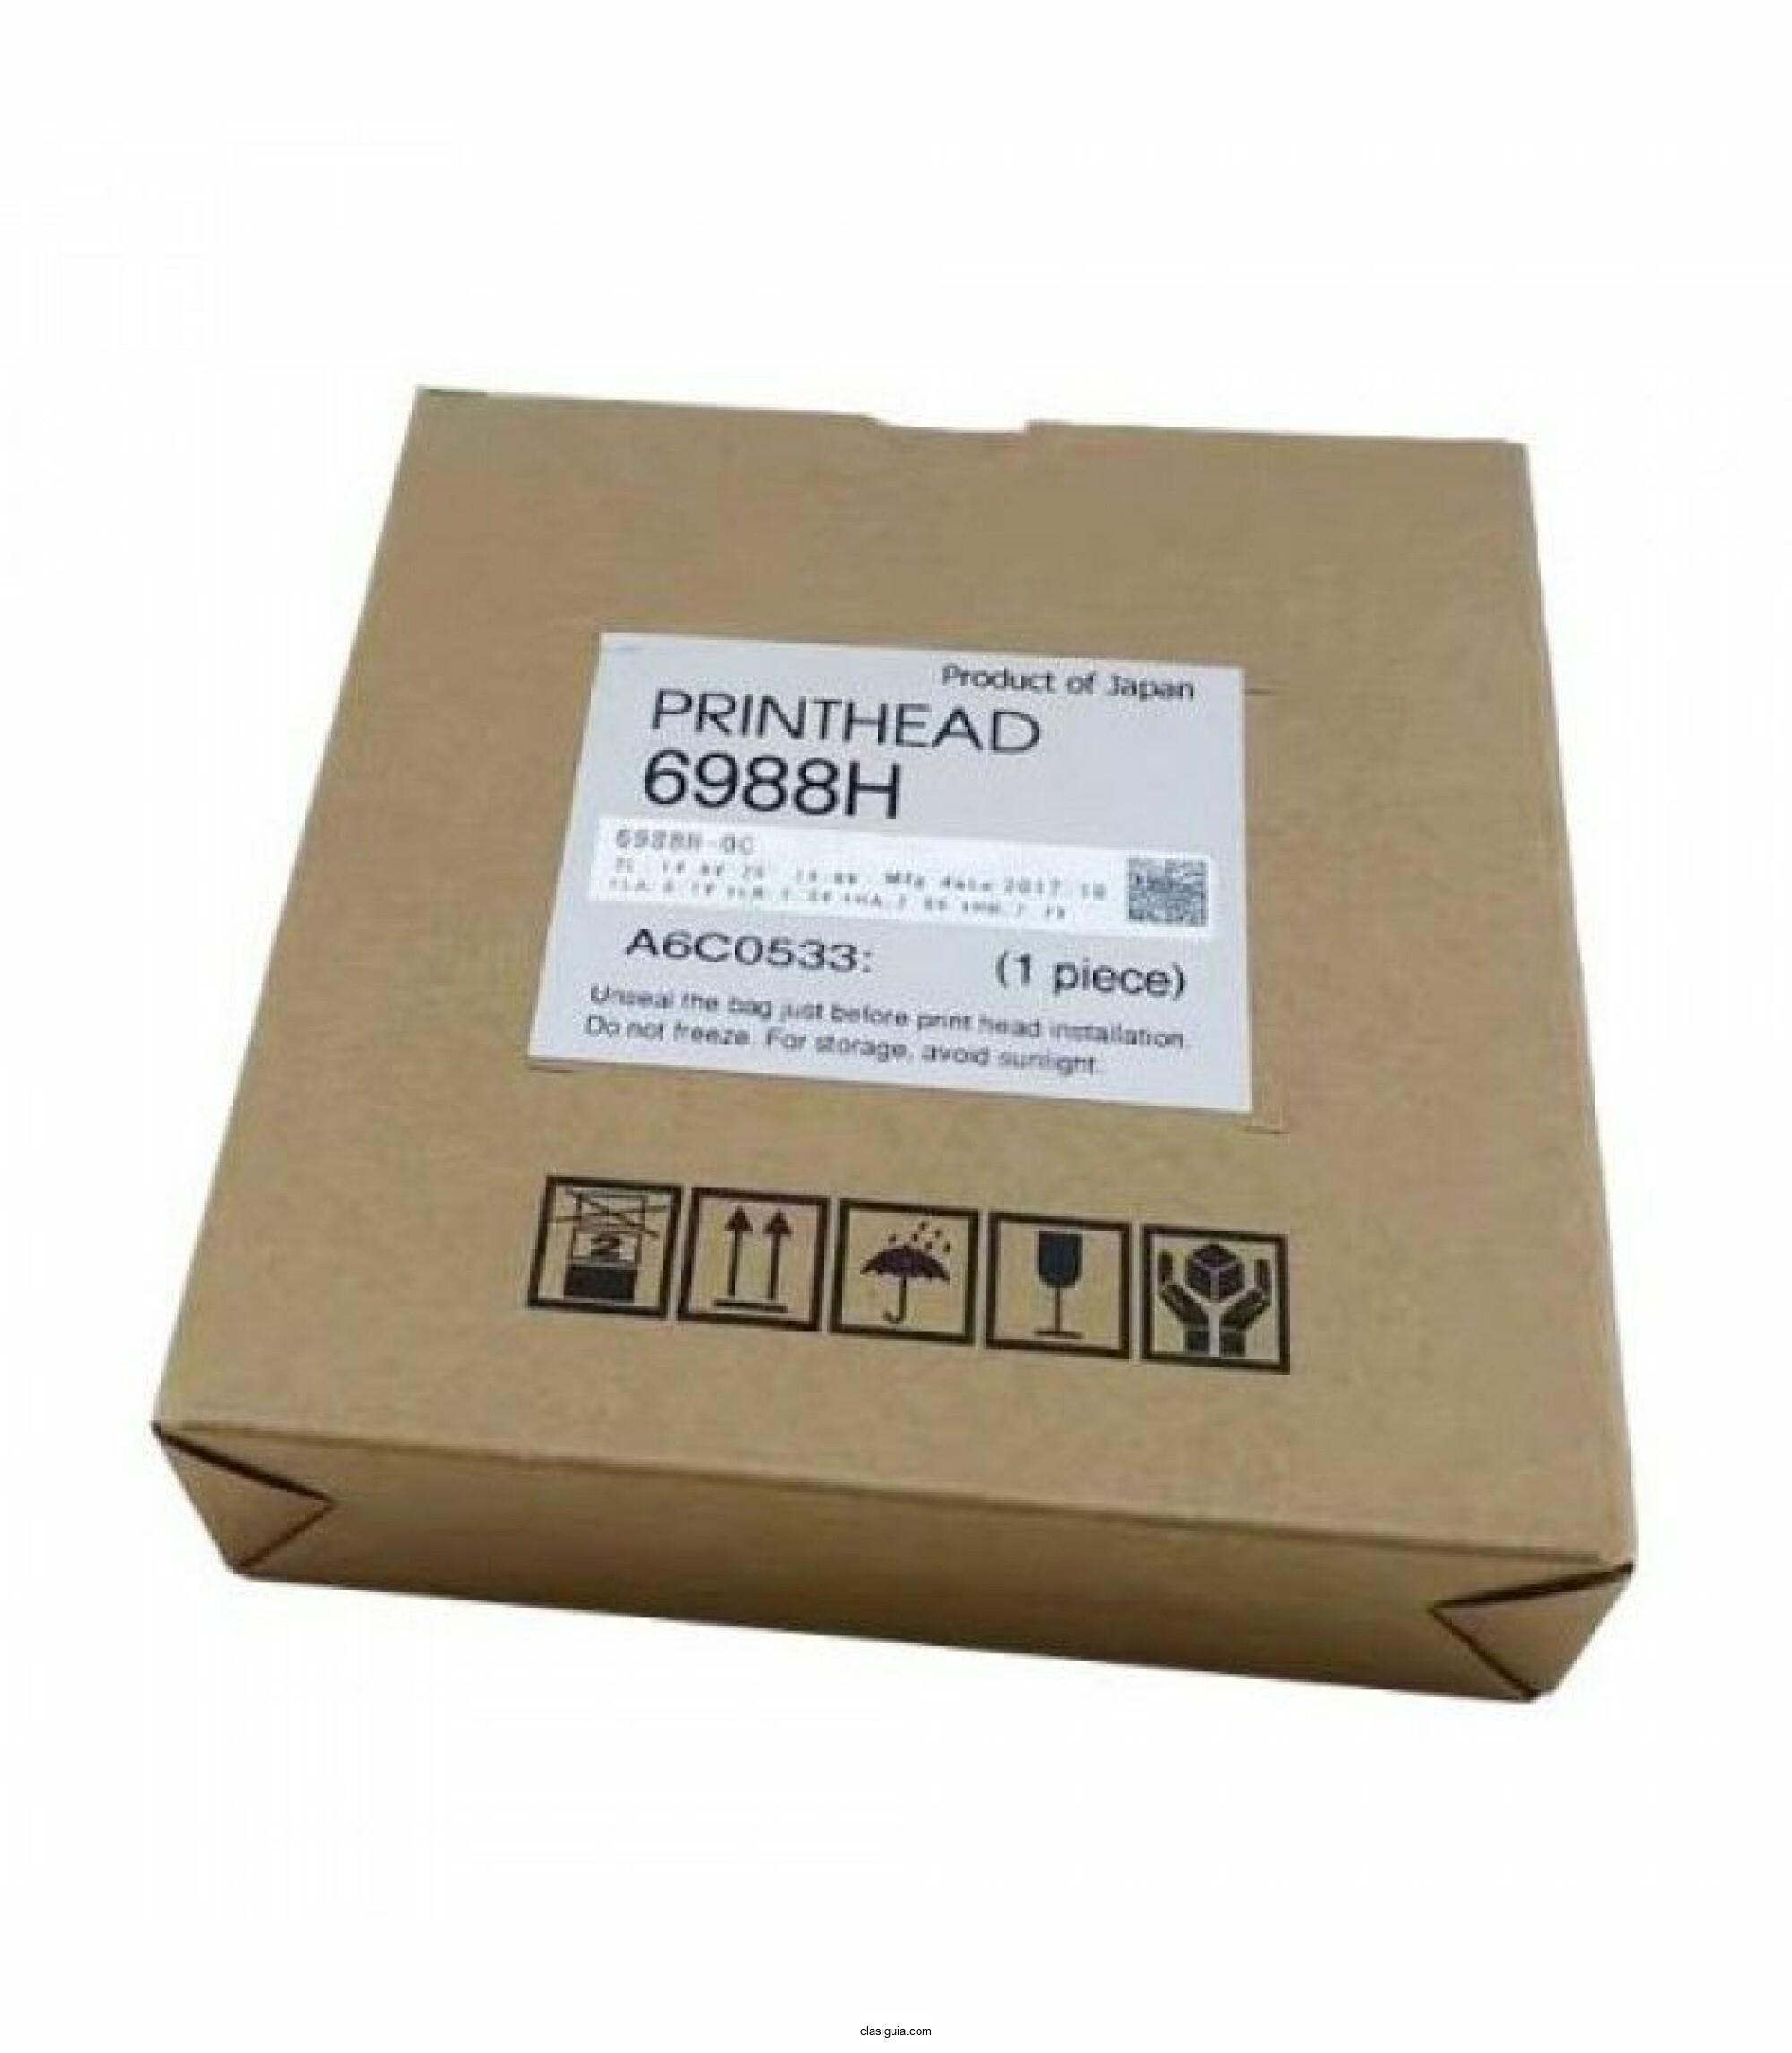 Konica 6988H (1024i-13pl) UV Printhead (ASOKA PRINTING)